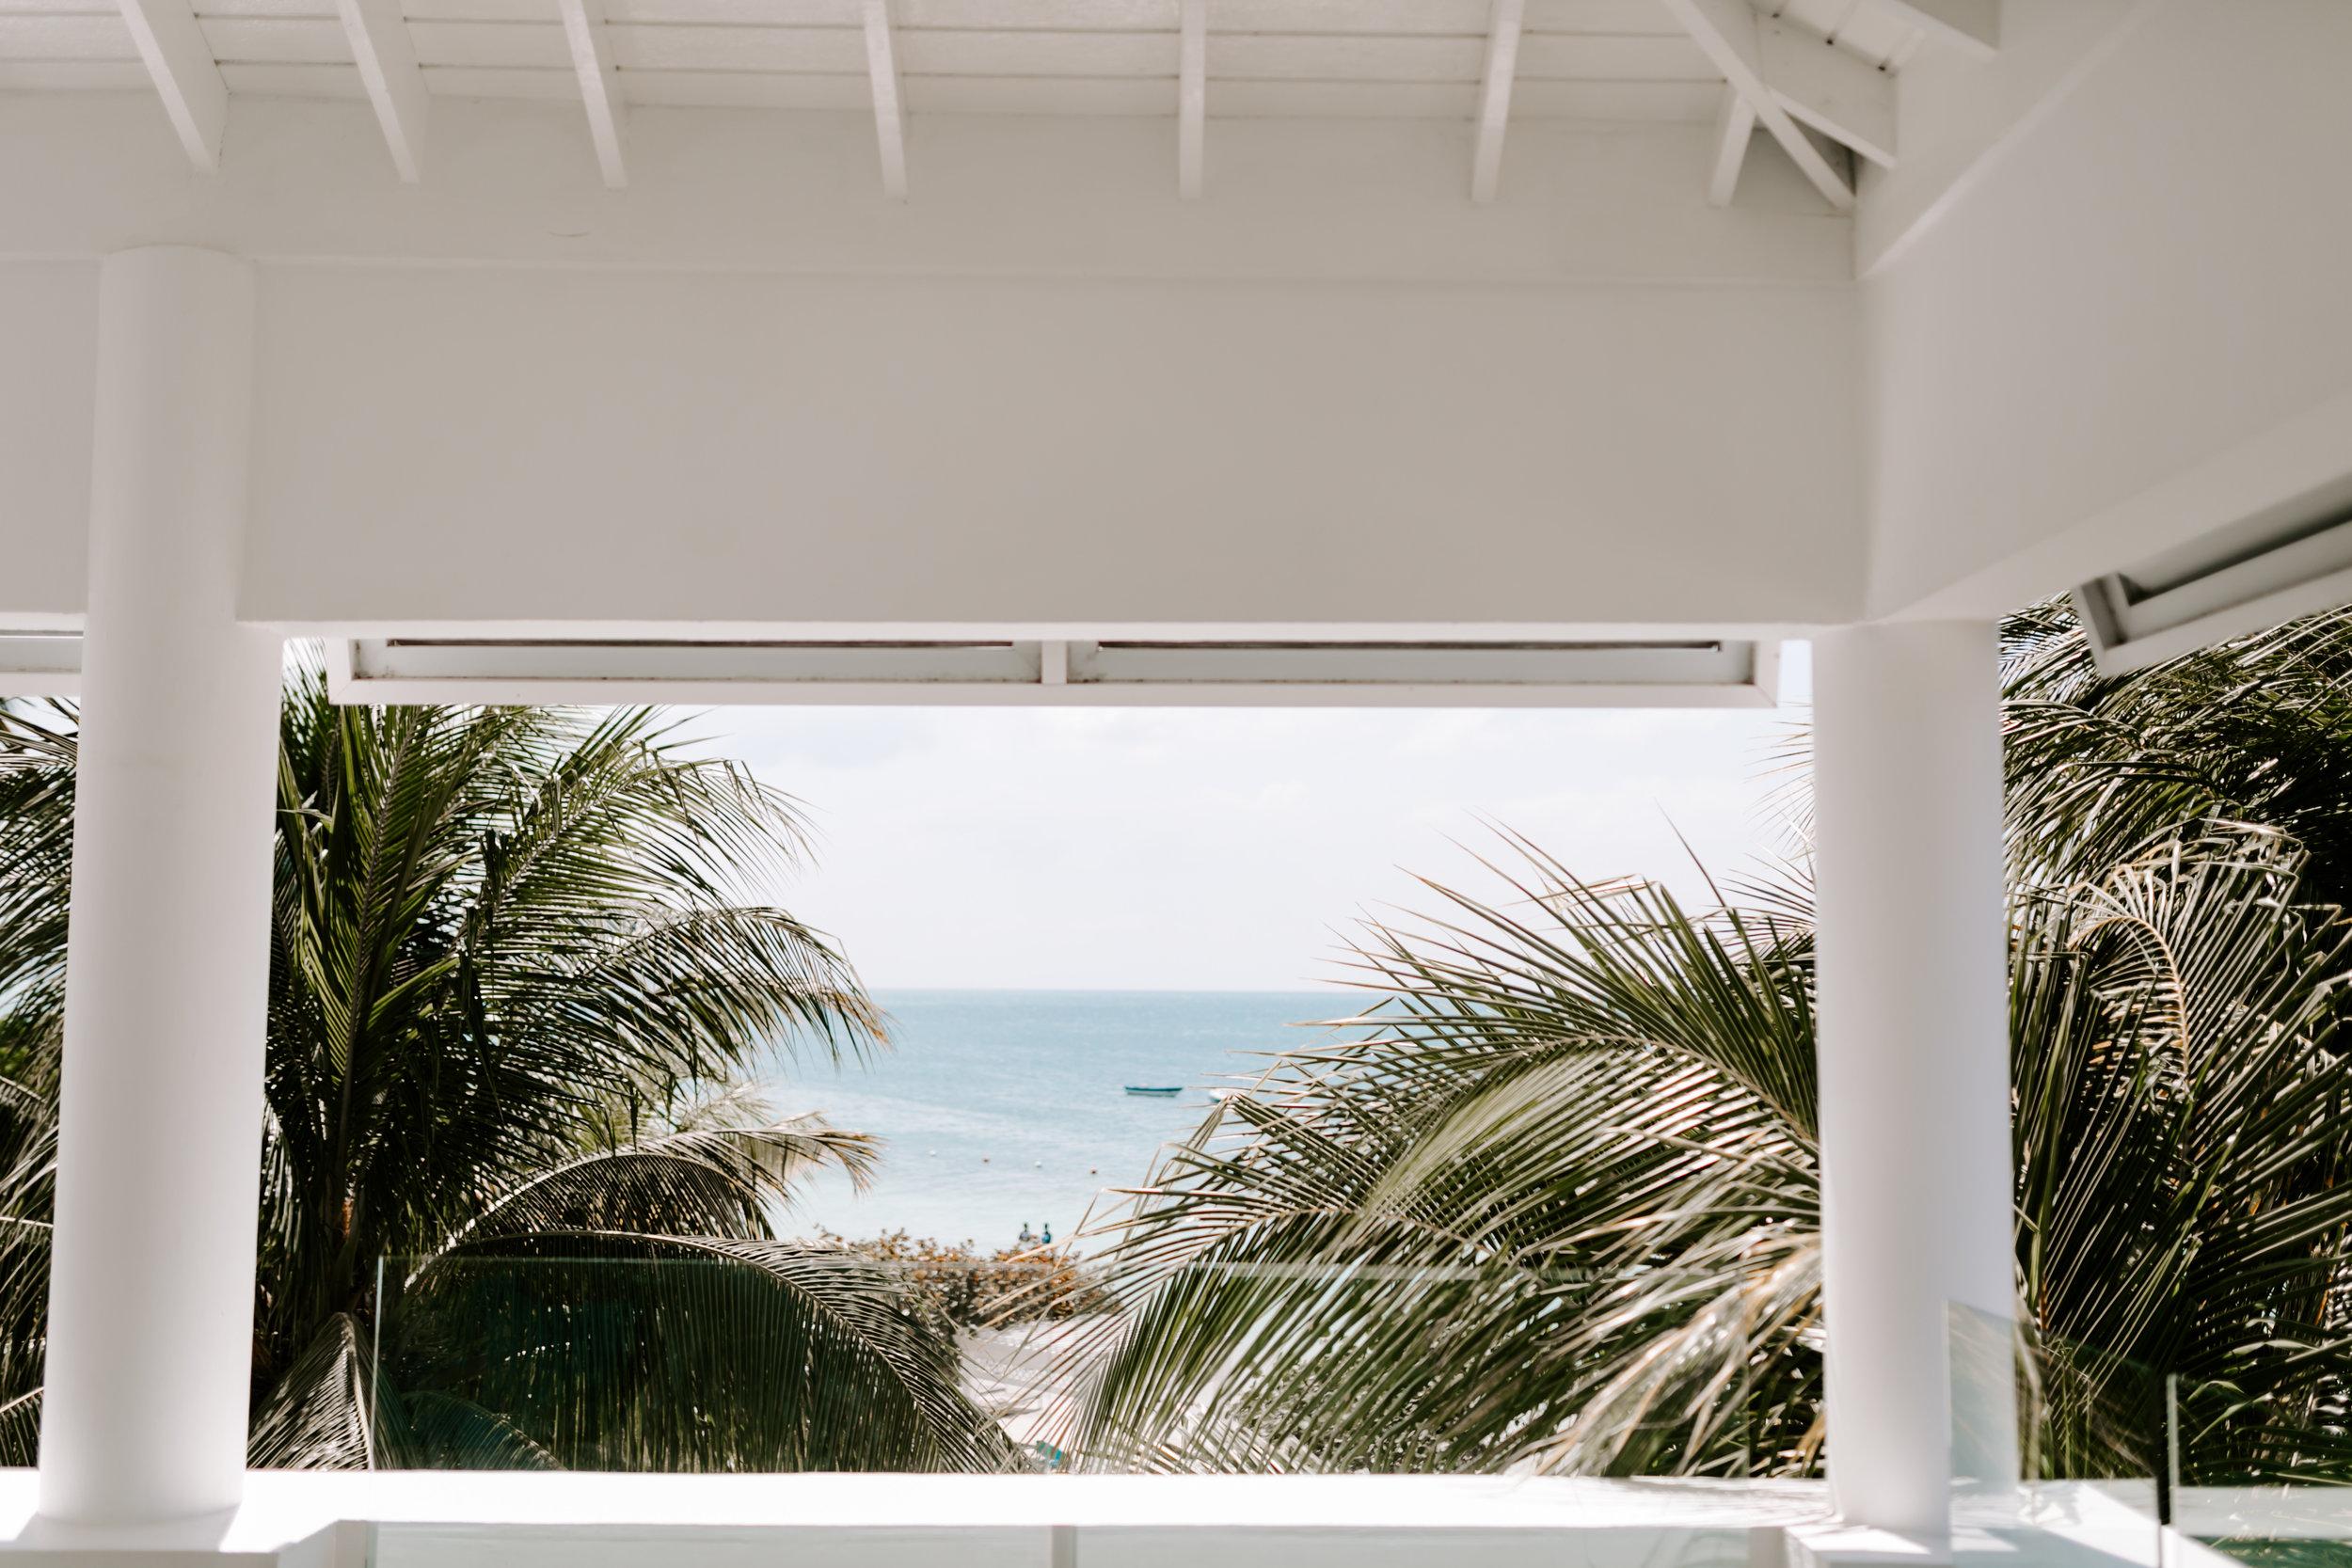 destination wedding, beach wedding, jamaica wedding, jamaican wedding, define fettle, tropical wedding